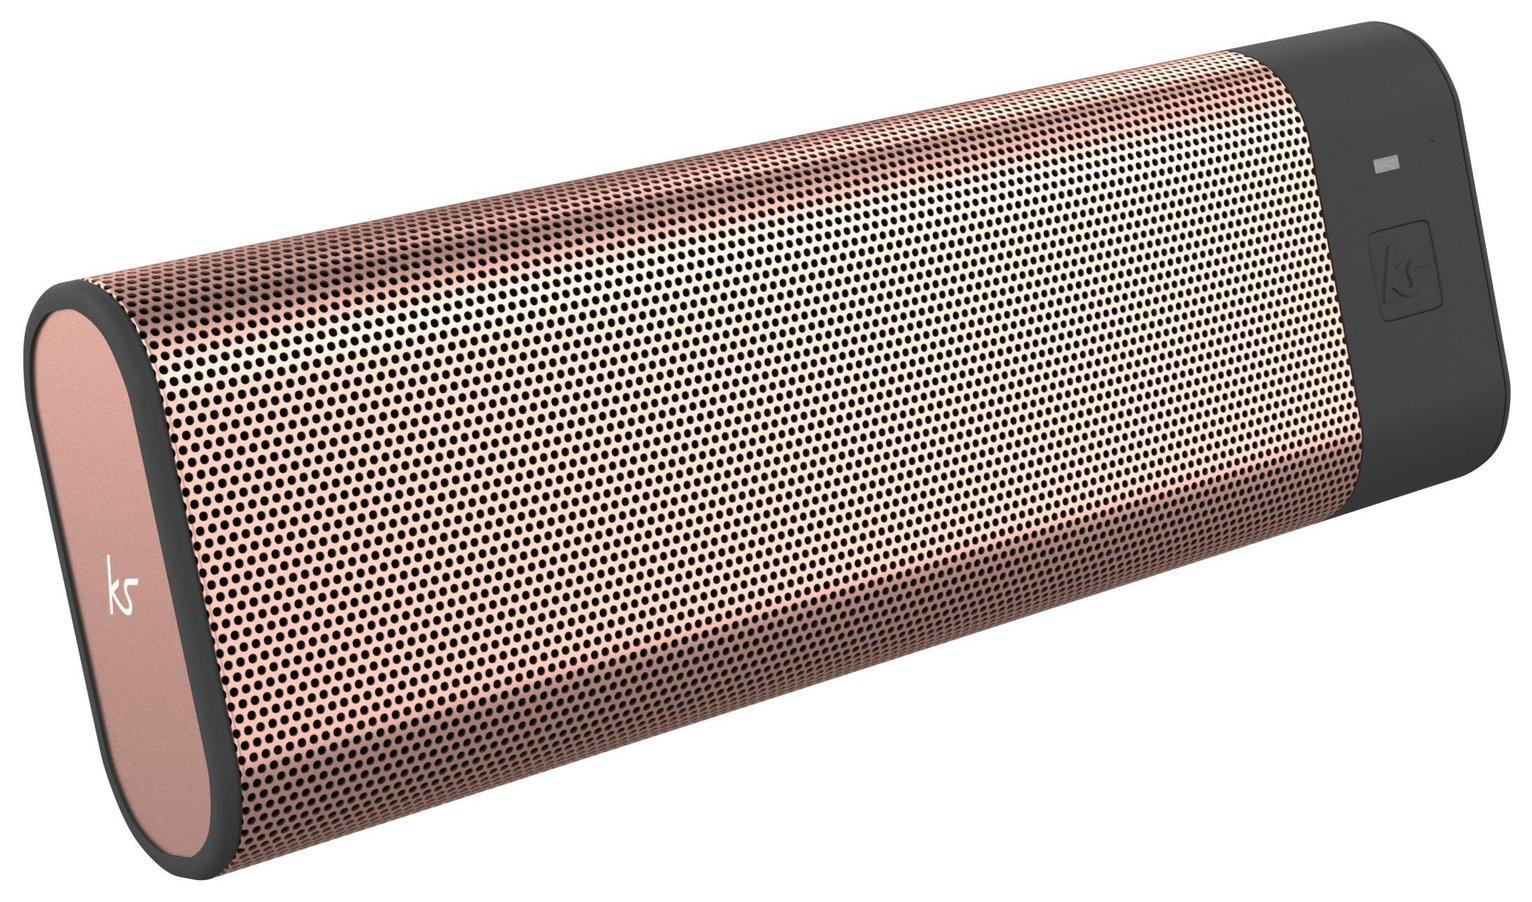 KitSound Boombar Portable Wireless Speaker - Rose Gold